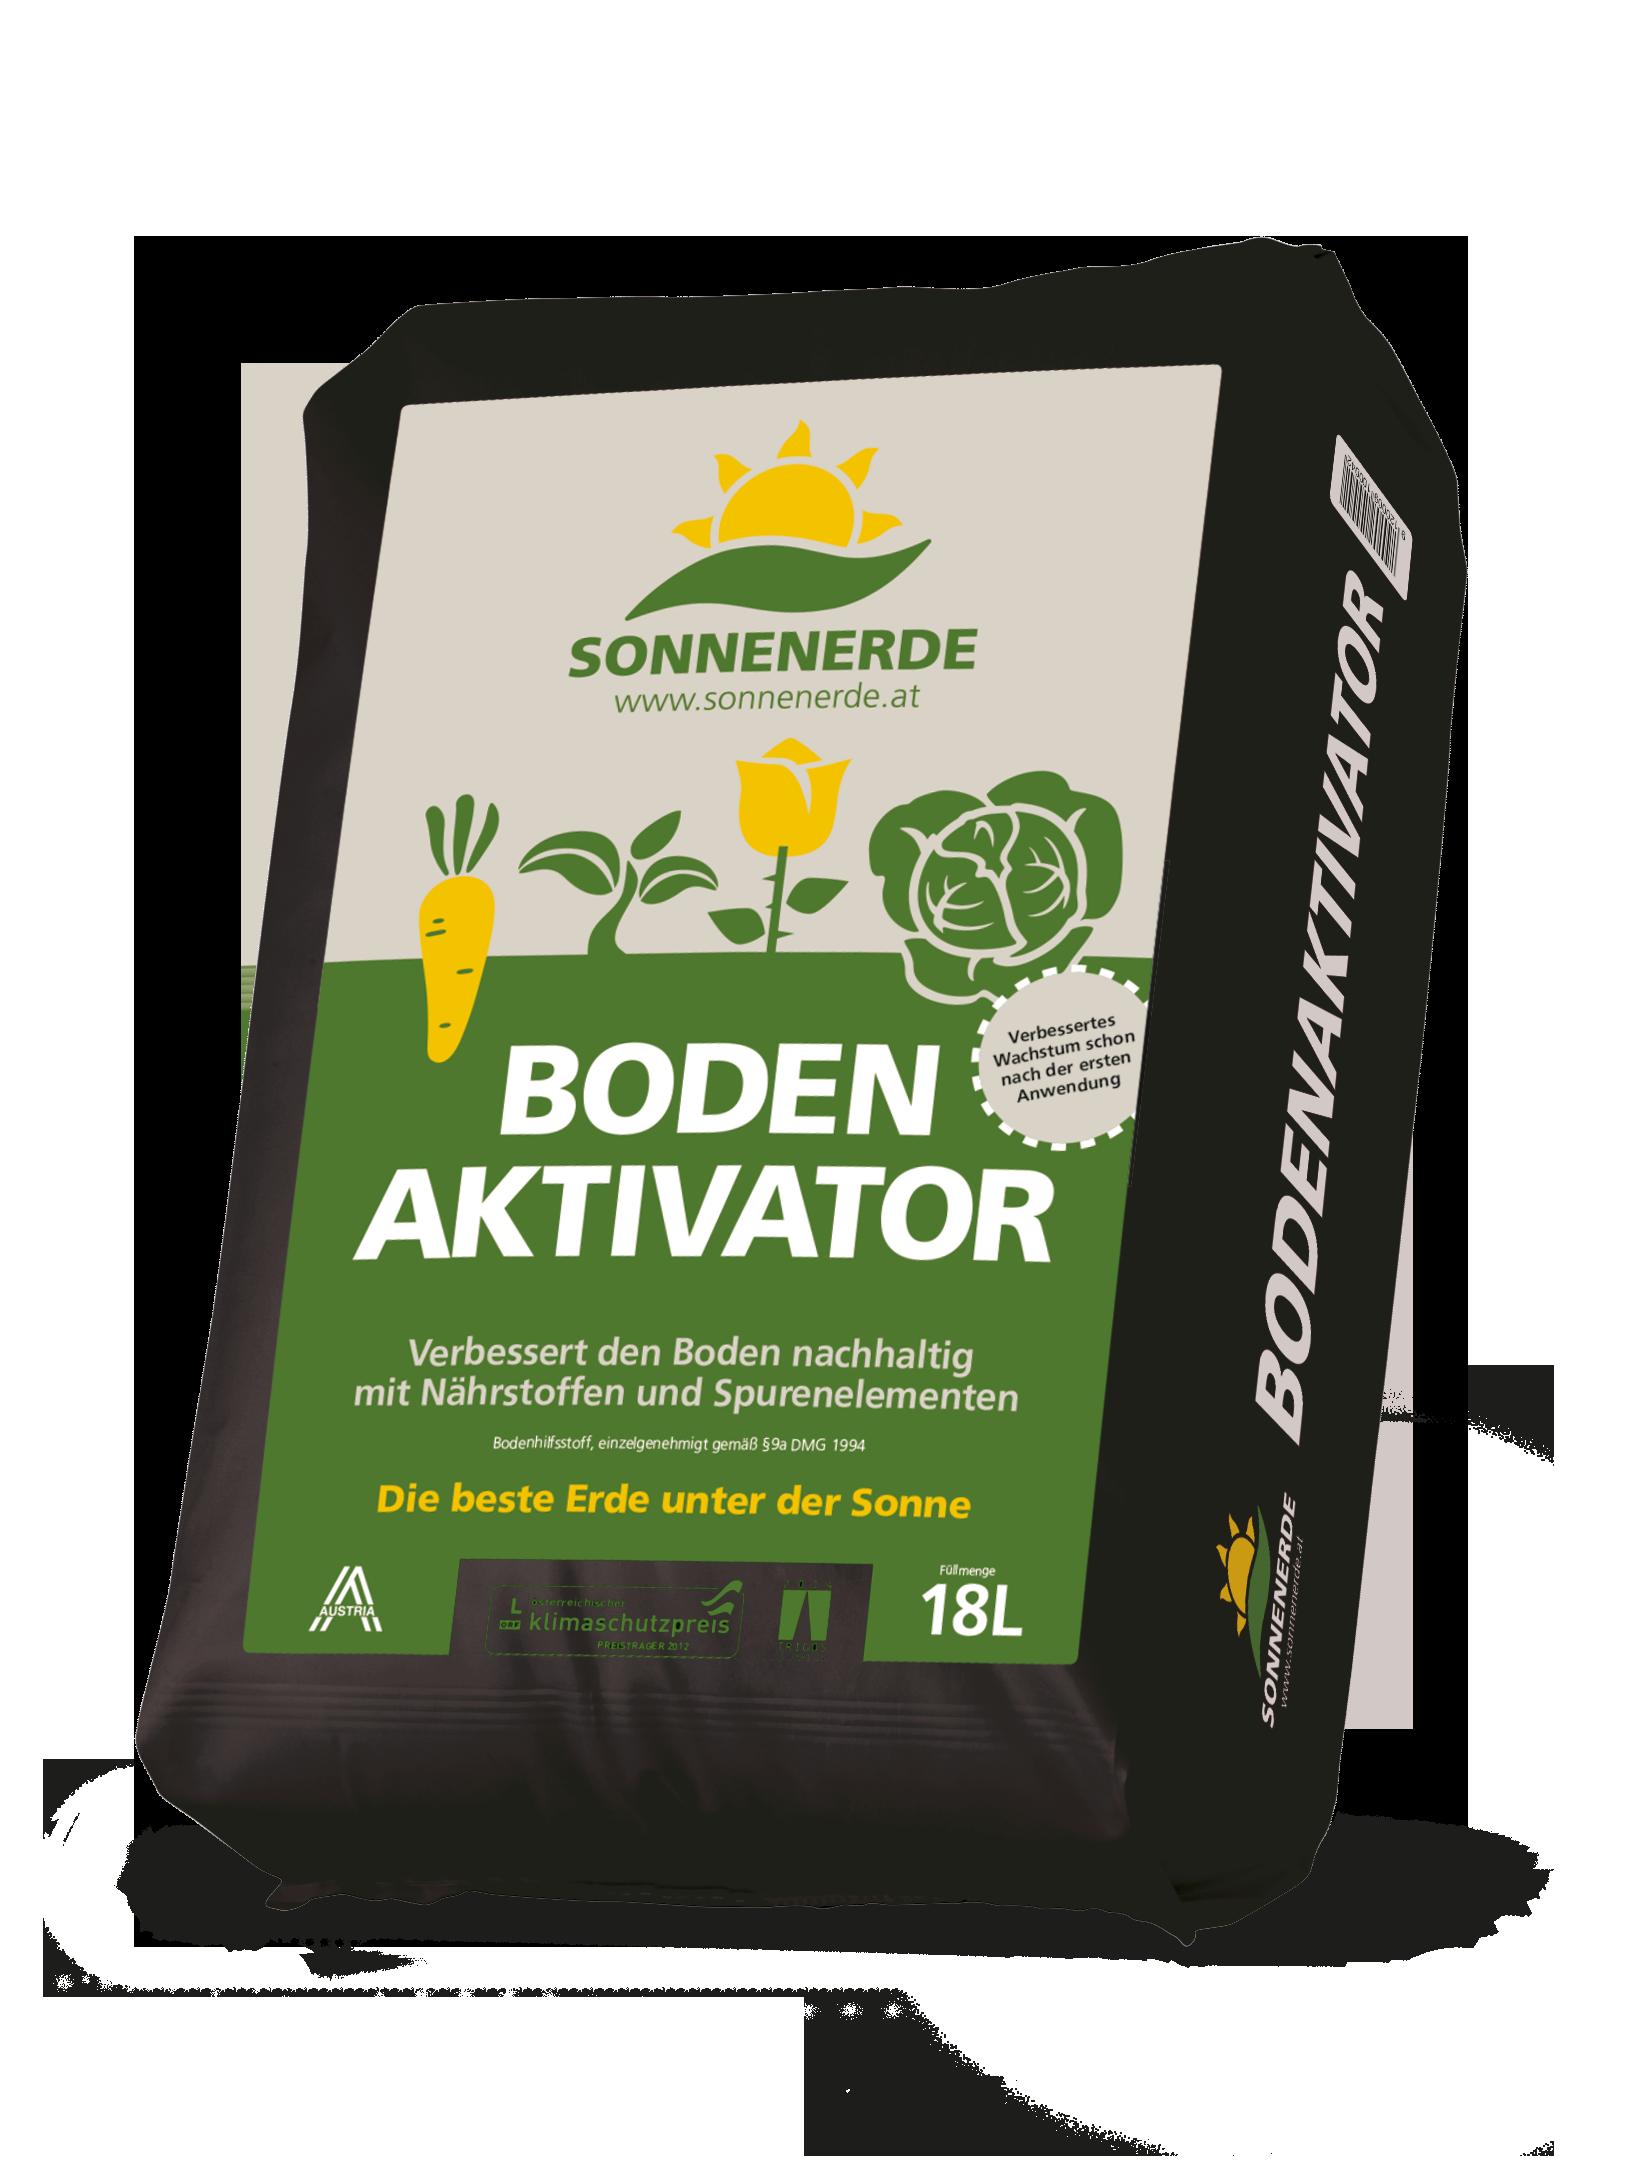 Bodenaktivator | Sonnenerde GmbH